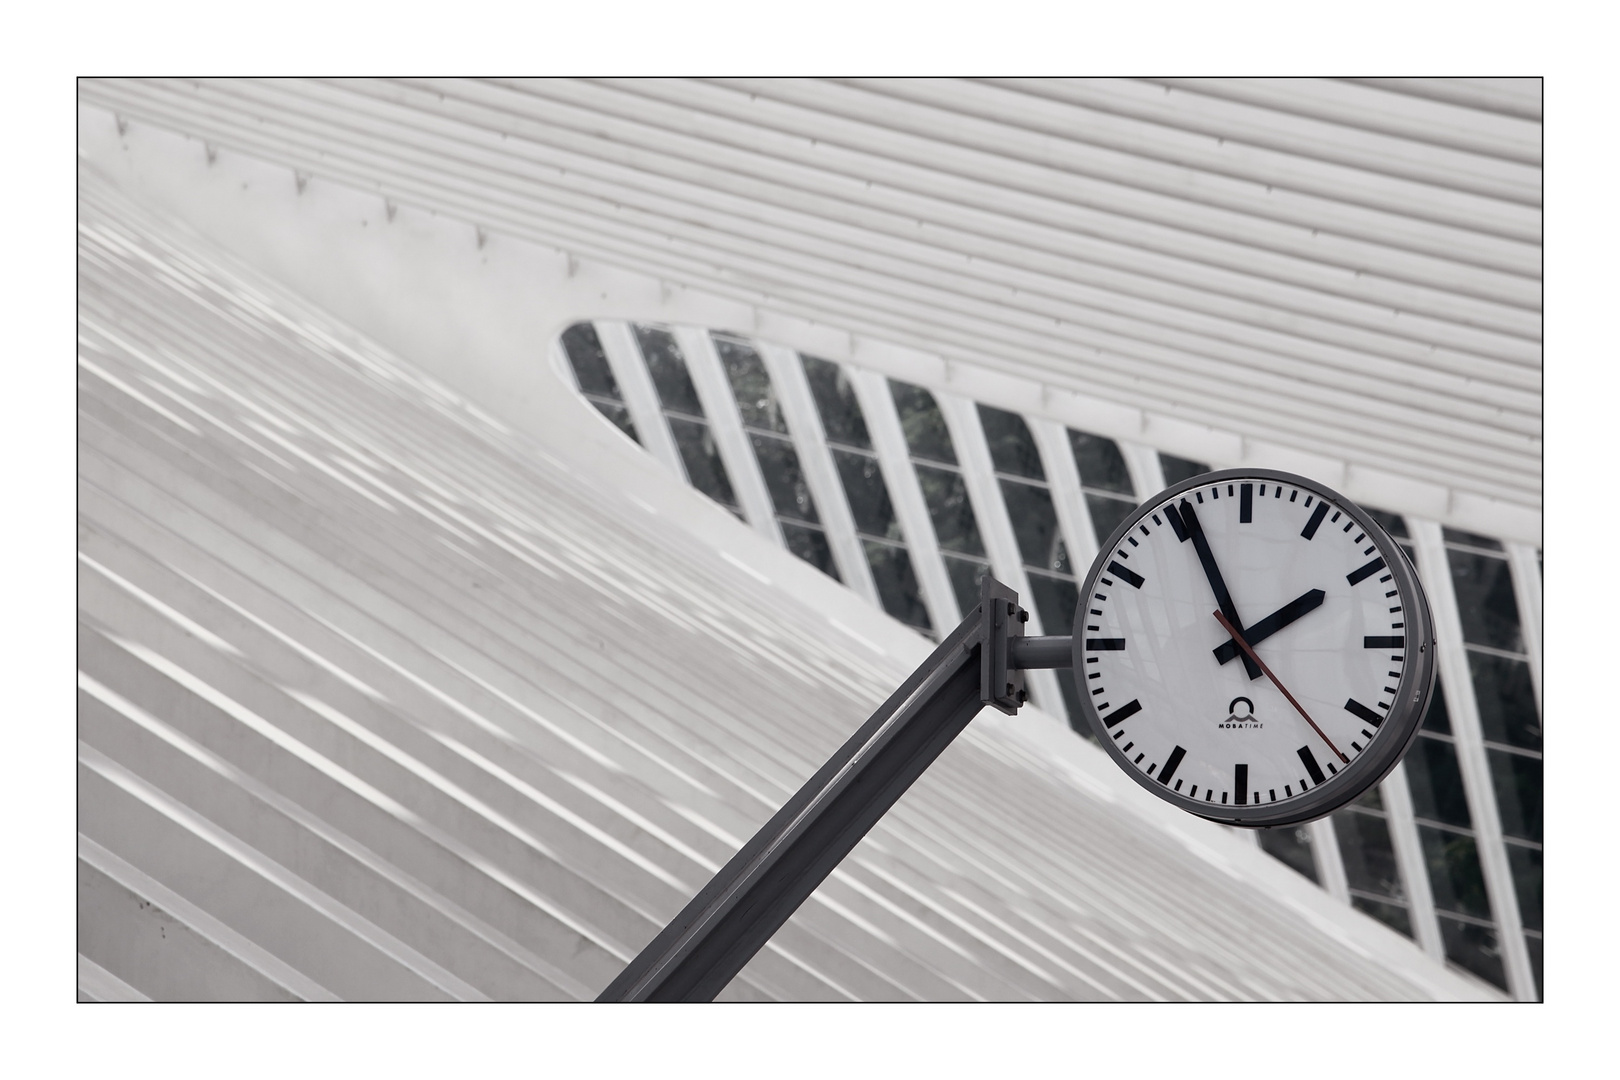 13:56:23